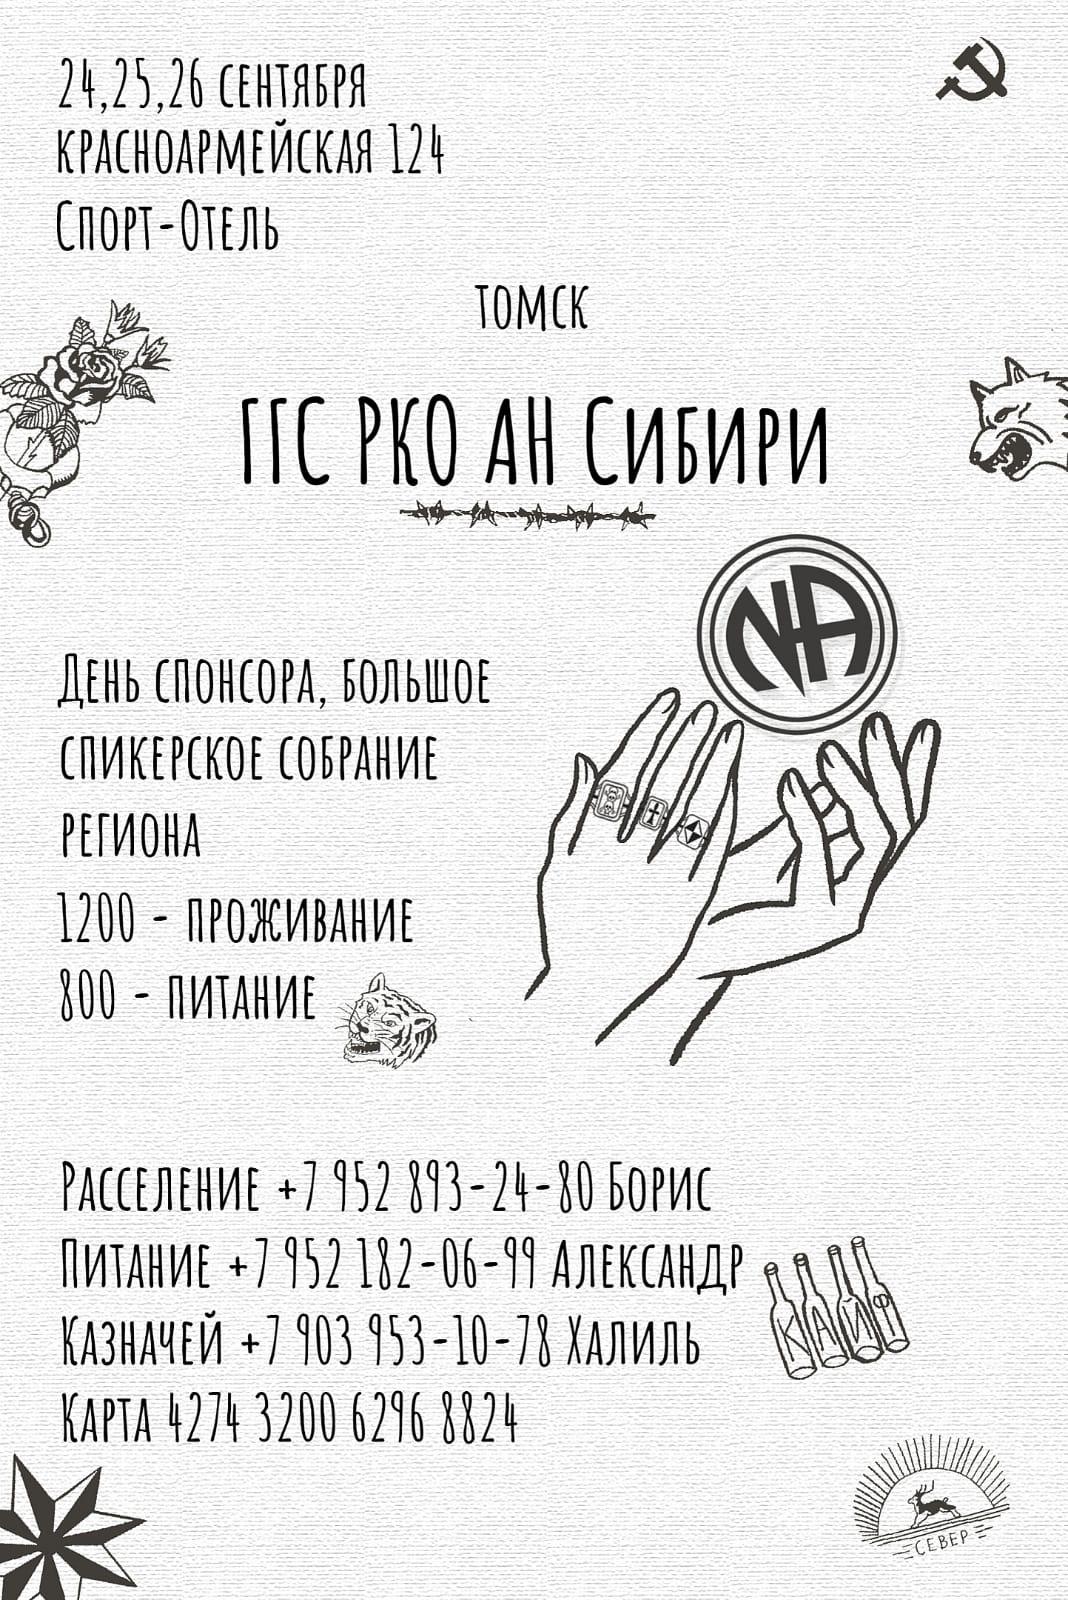 Главное годовое собрание РКО АН Сибири